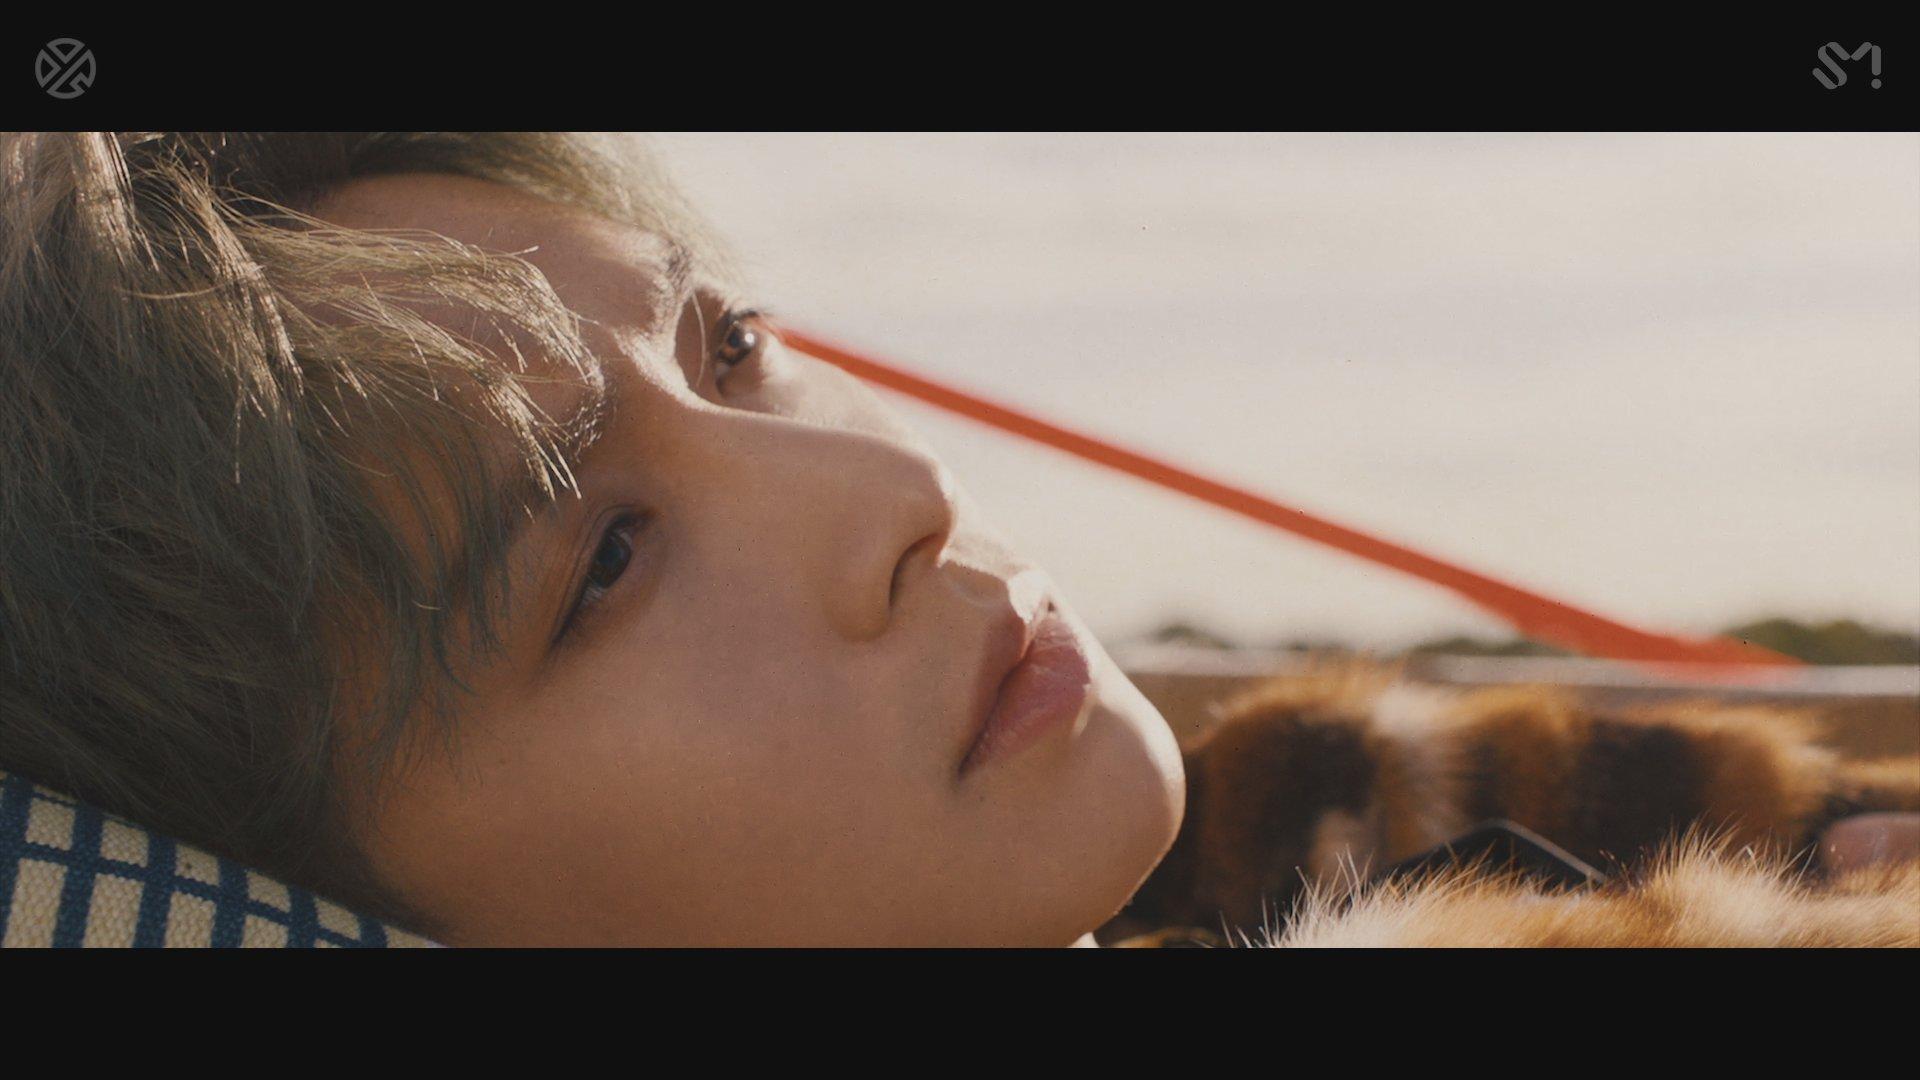 LAY 레이 'NAMANANA' MV Teaser  �� 'NAMANANA' 음원 공개: 2018.10.19. 4PM(KST)   #LAY #레이 #EXO #엑소 #NAMANANA https://t.co/ZdMPC1boVx